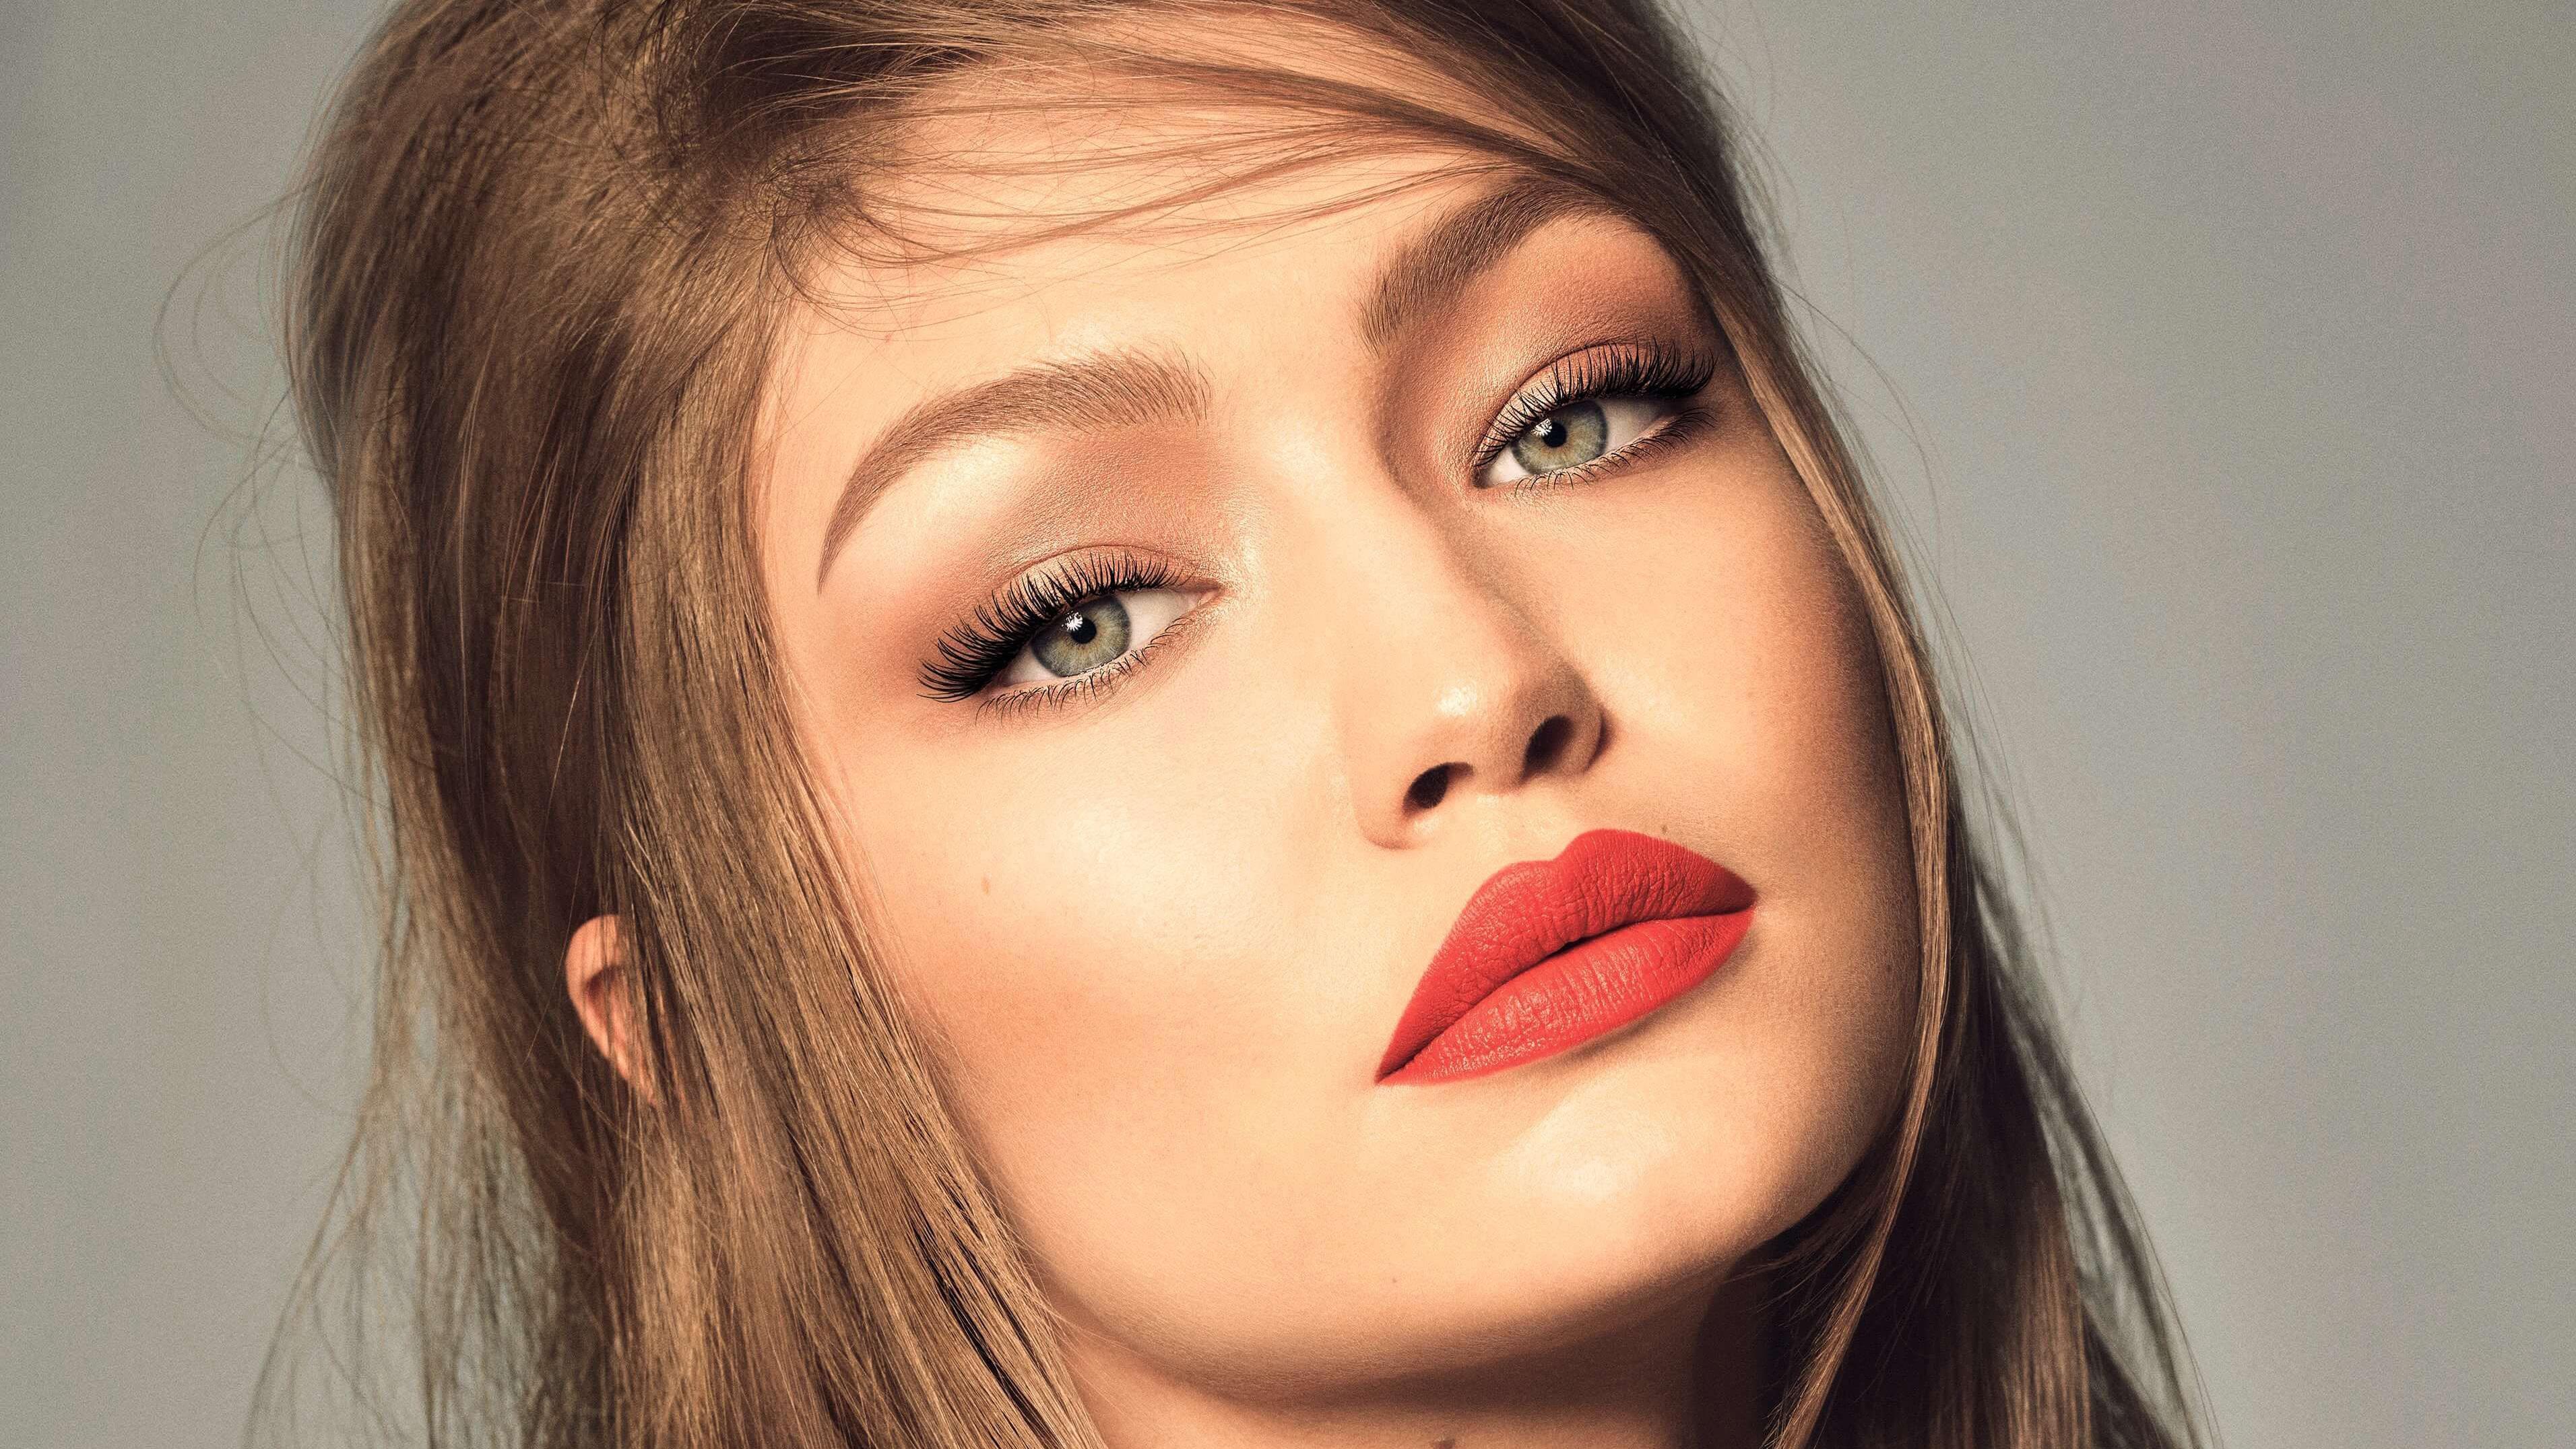 Gigi Hadid American Model 4k Hd Celebrities 4k Wallpapers Images